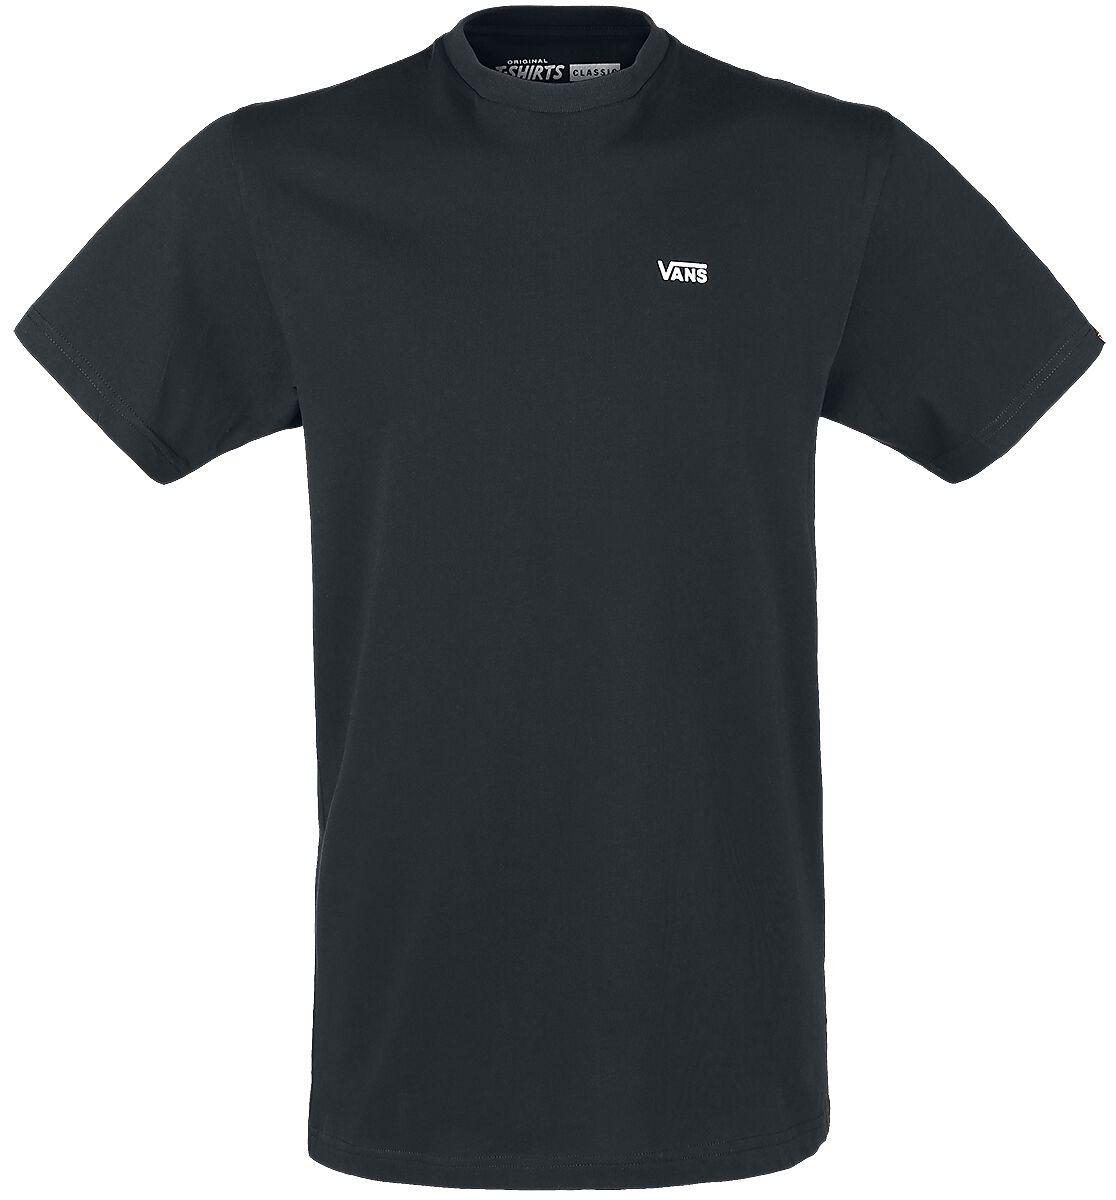 Image of   Vans Left Chest Logo Tee T-Shirt sort